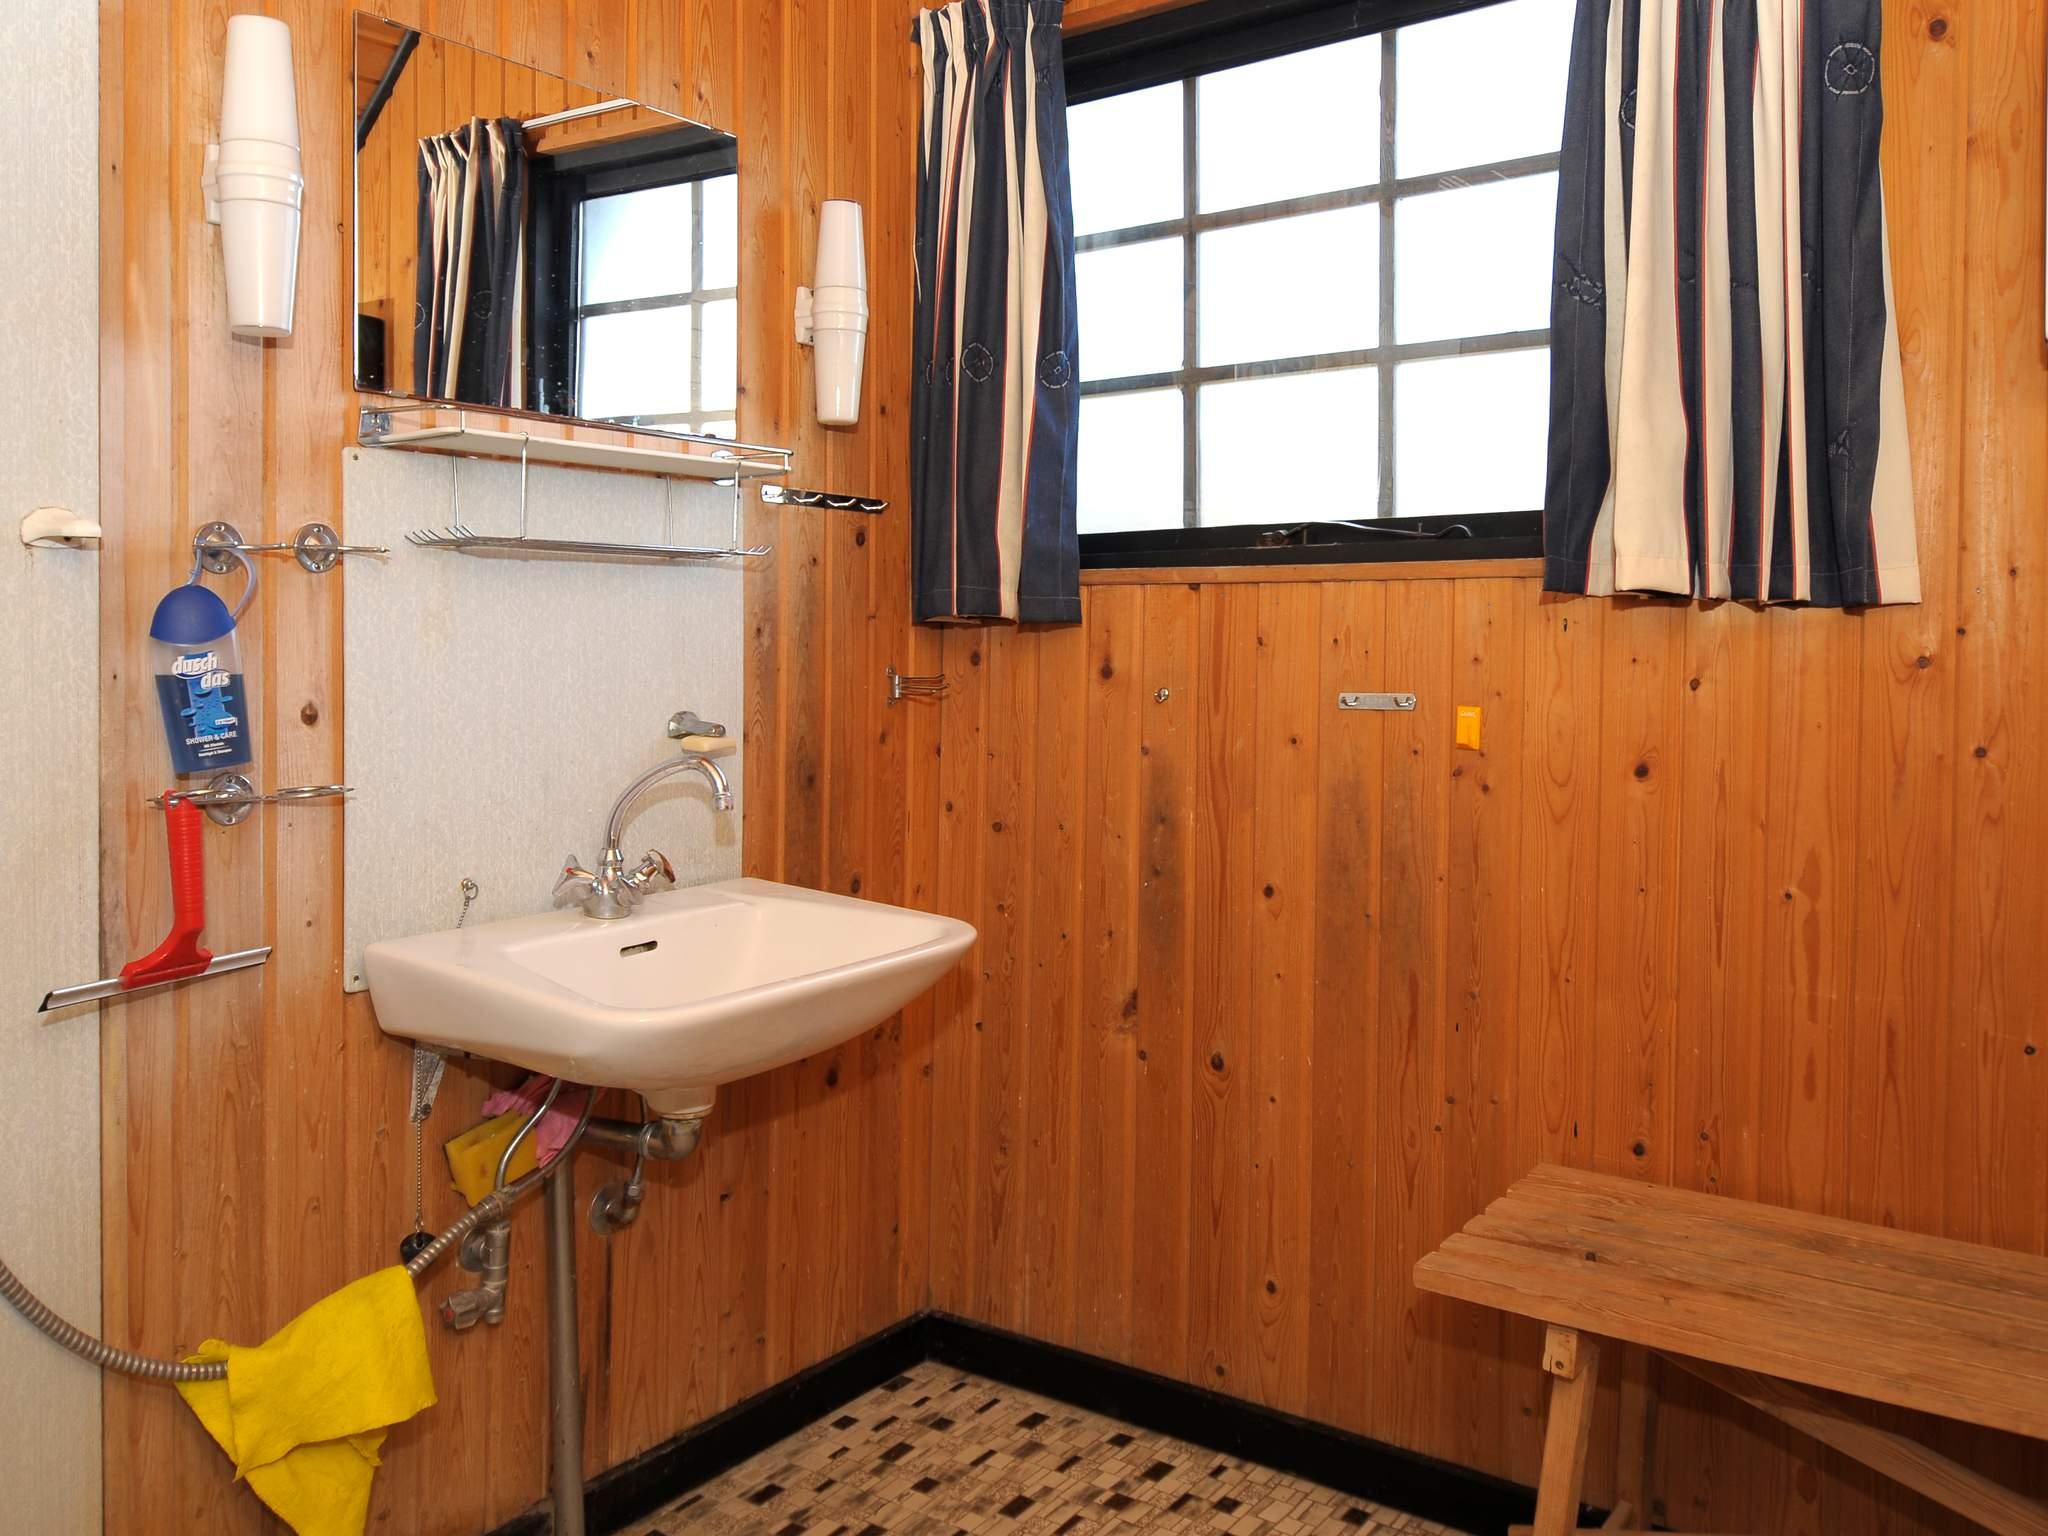 Ferienhaus Blåvand (82266), Blåvand, , Westjütland, Dänemark, Bild 14